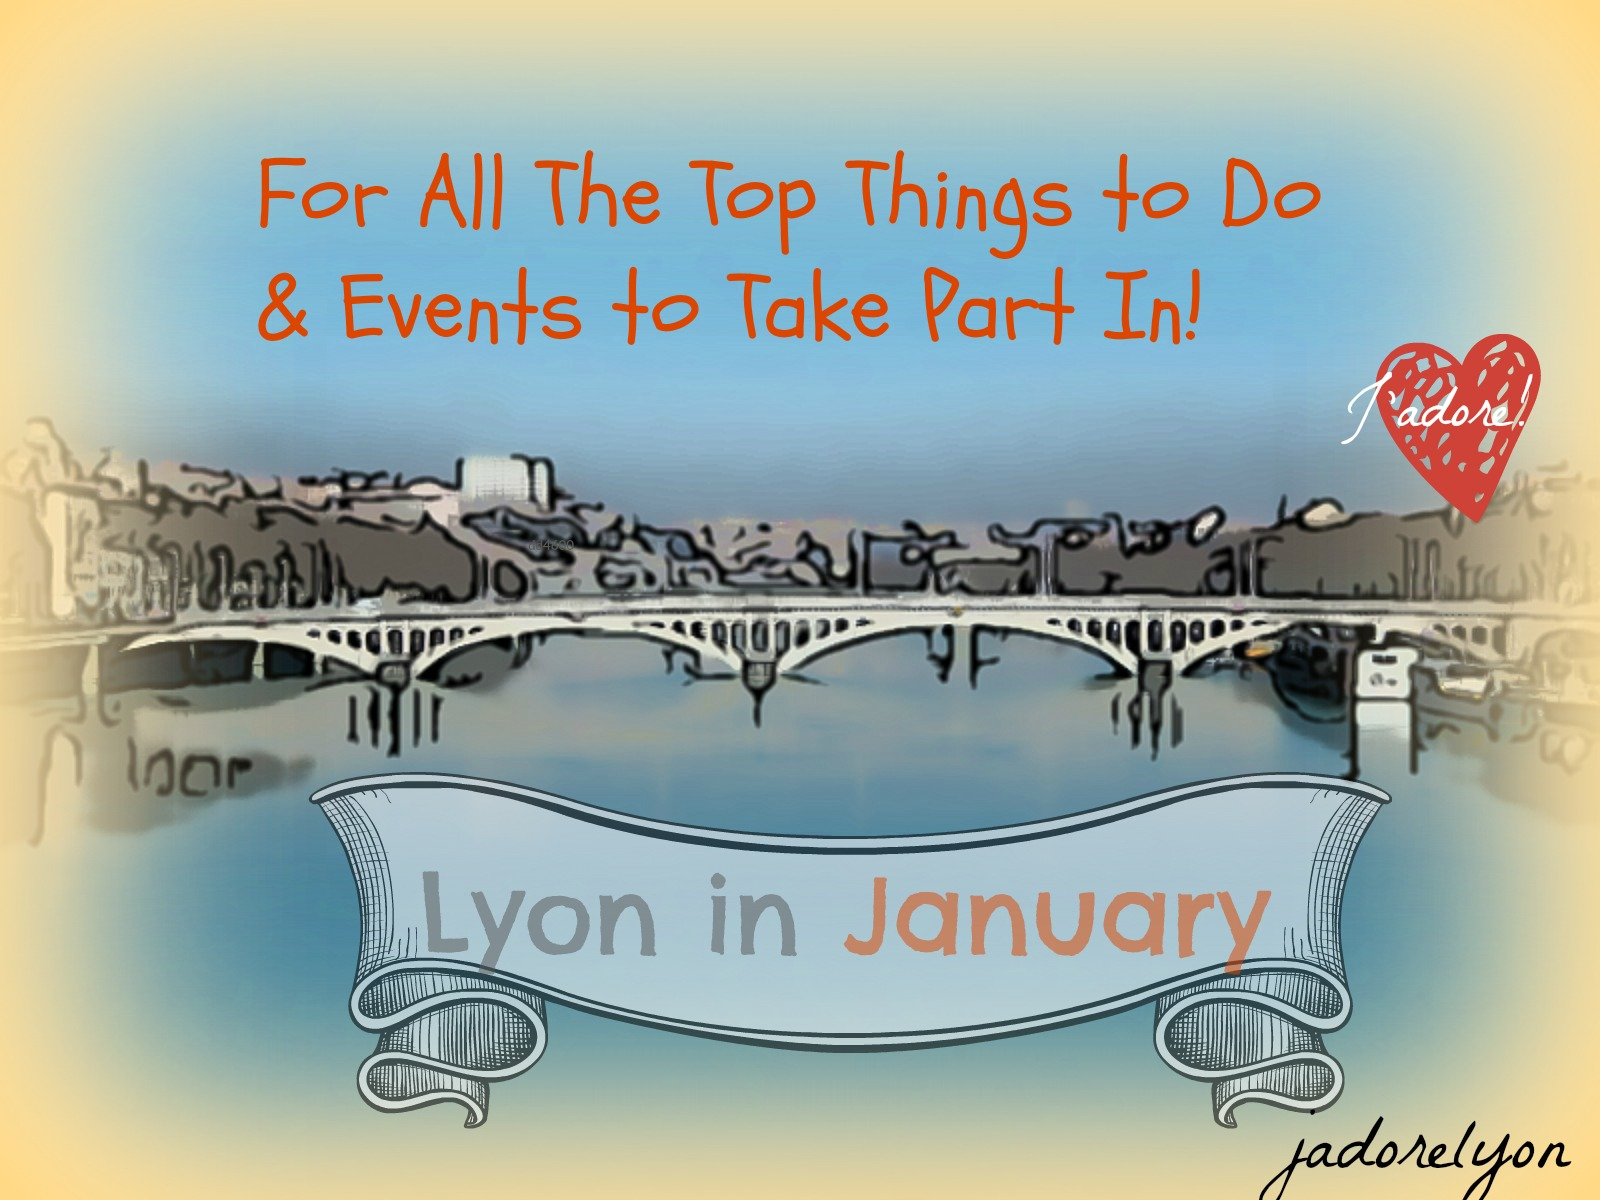 Lyon in January